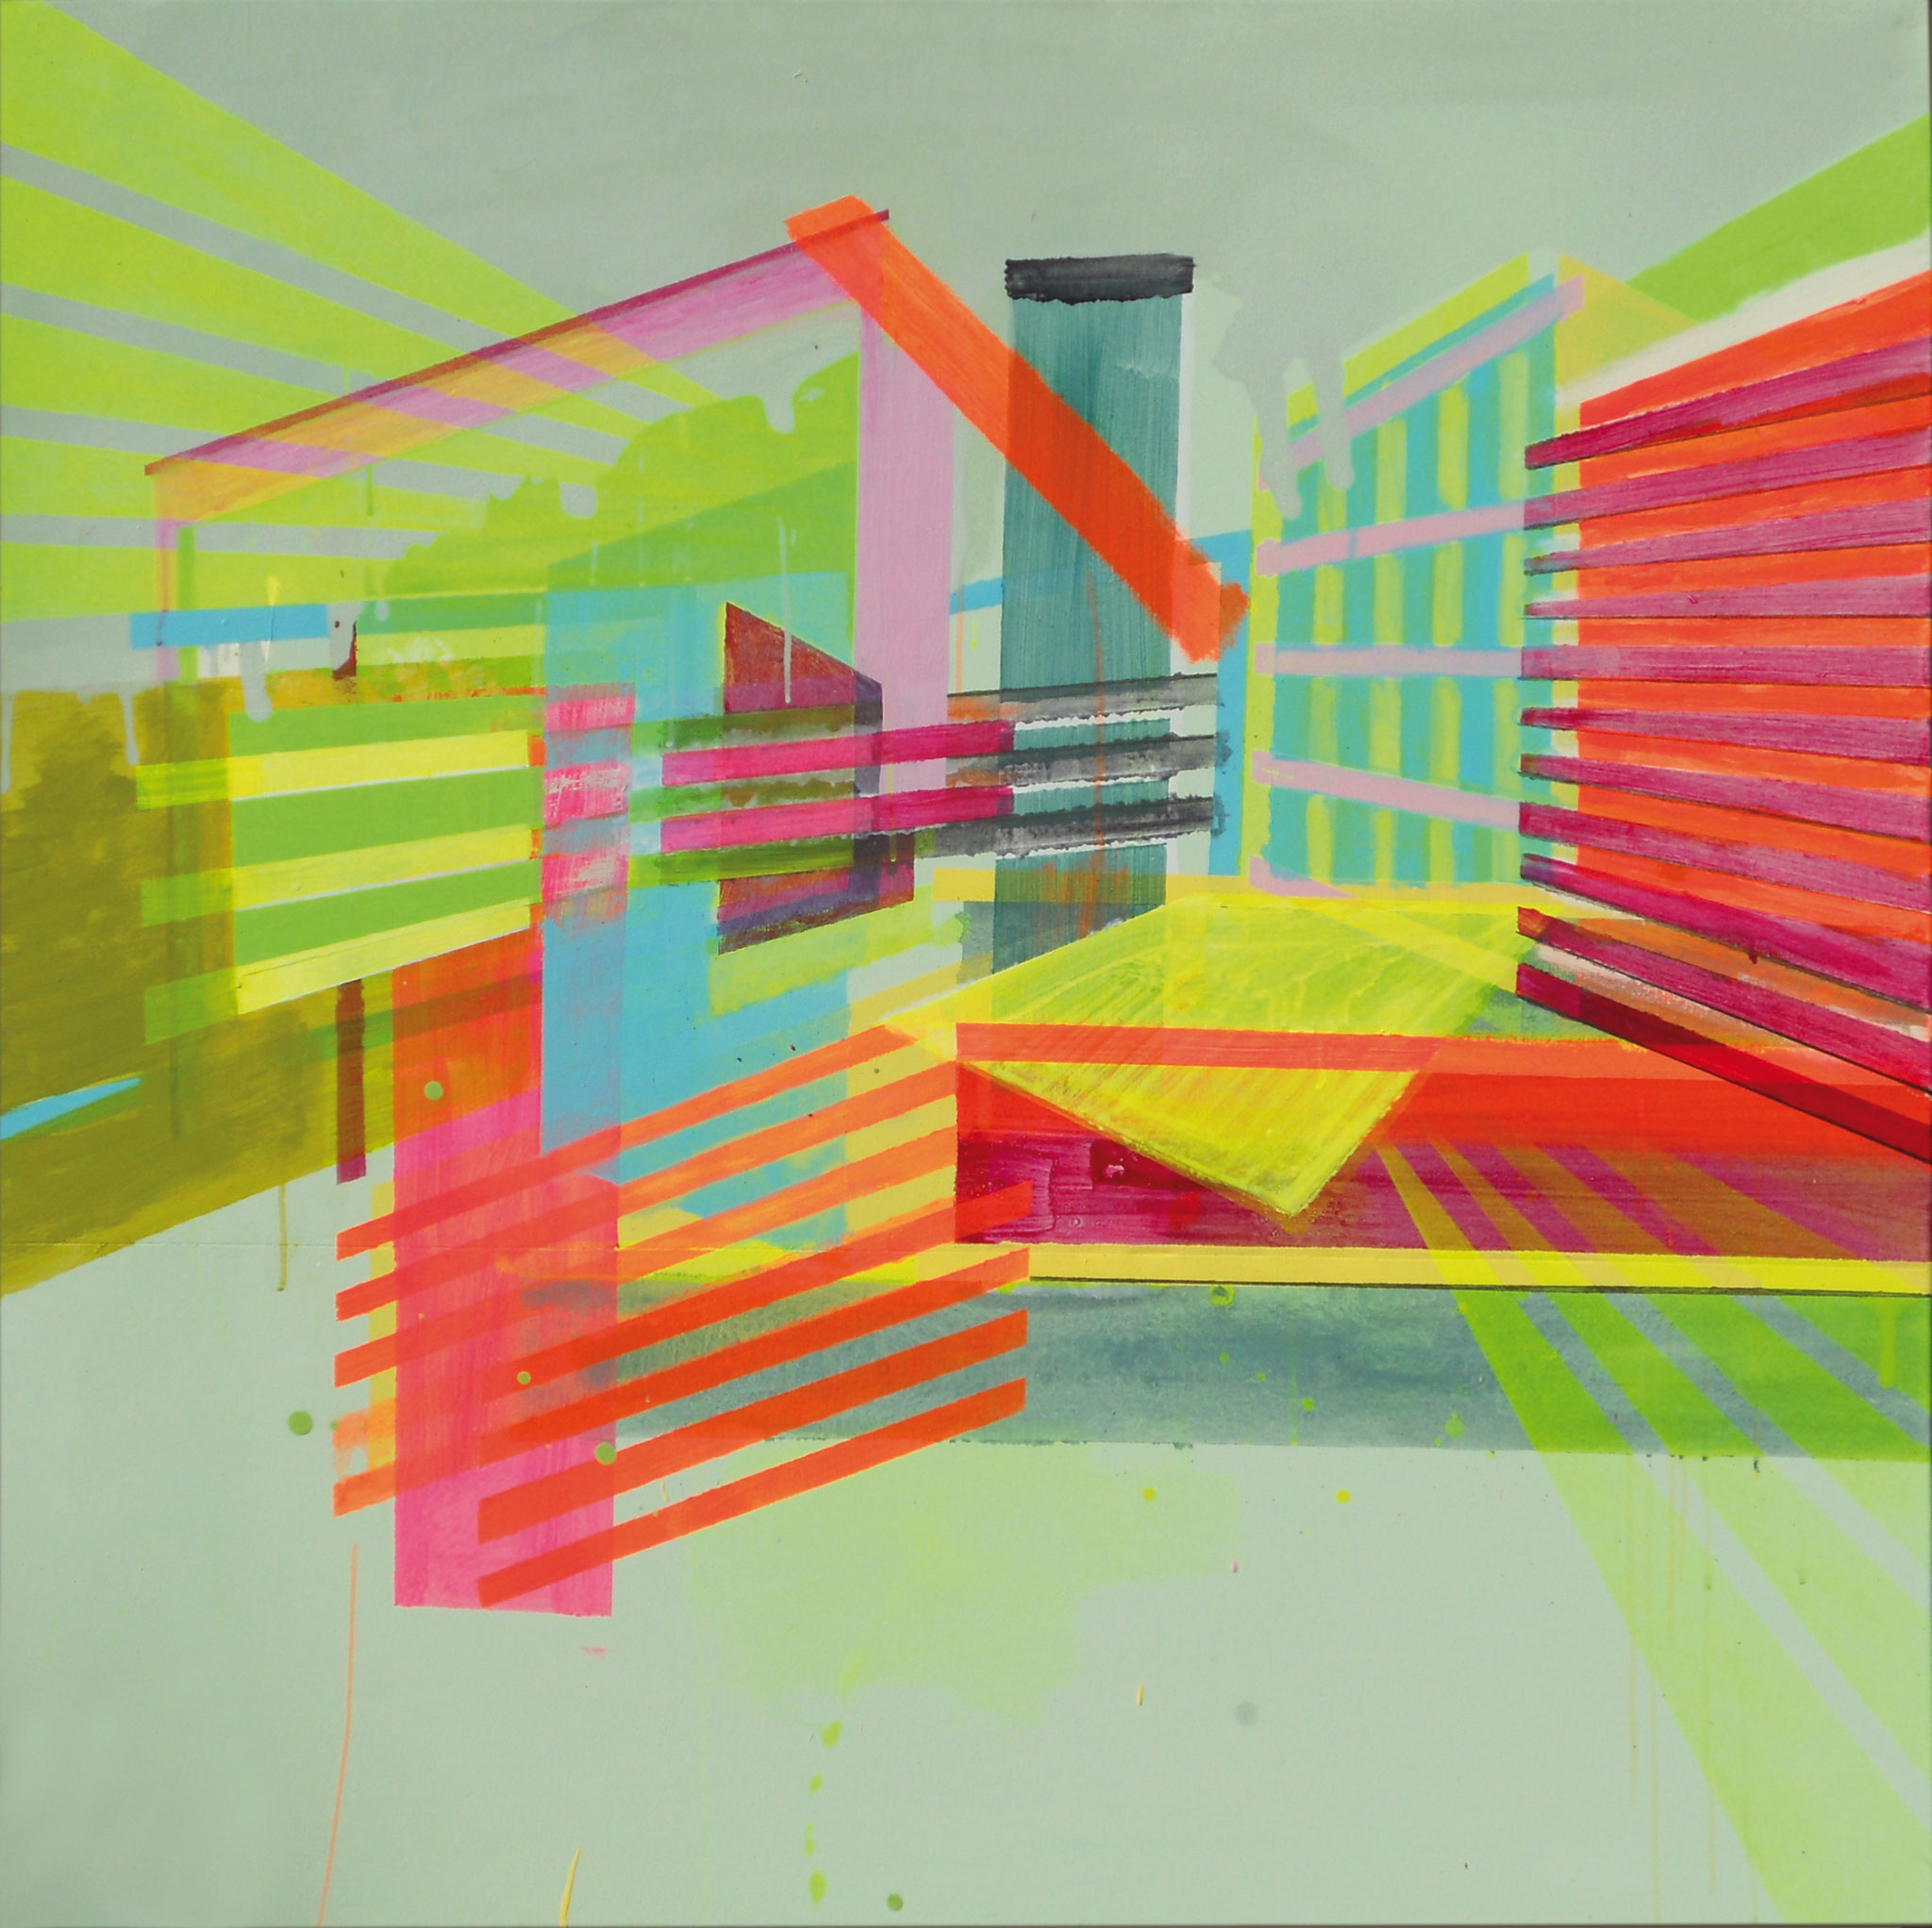 Light&Brigth 17 120x120 cm  2019 Pigmente/Binder auf Leinwand